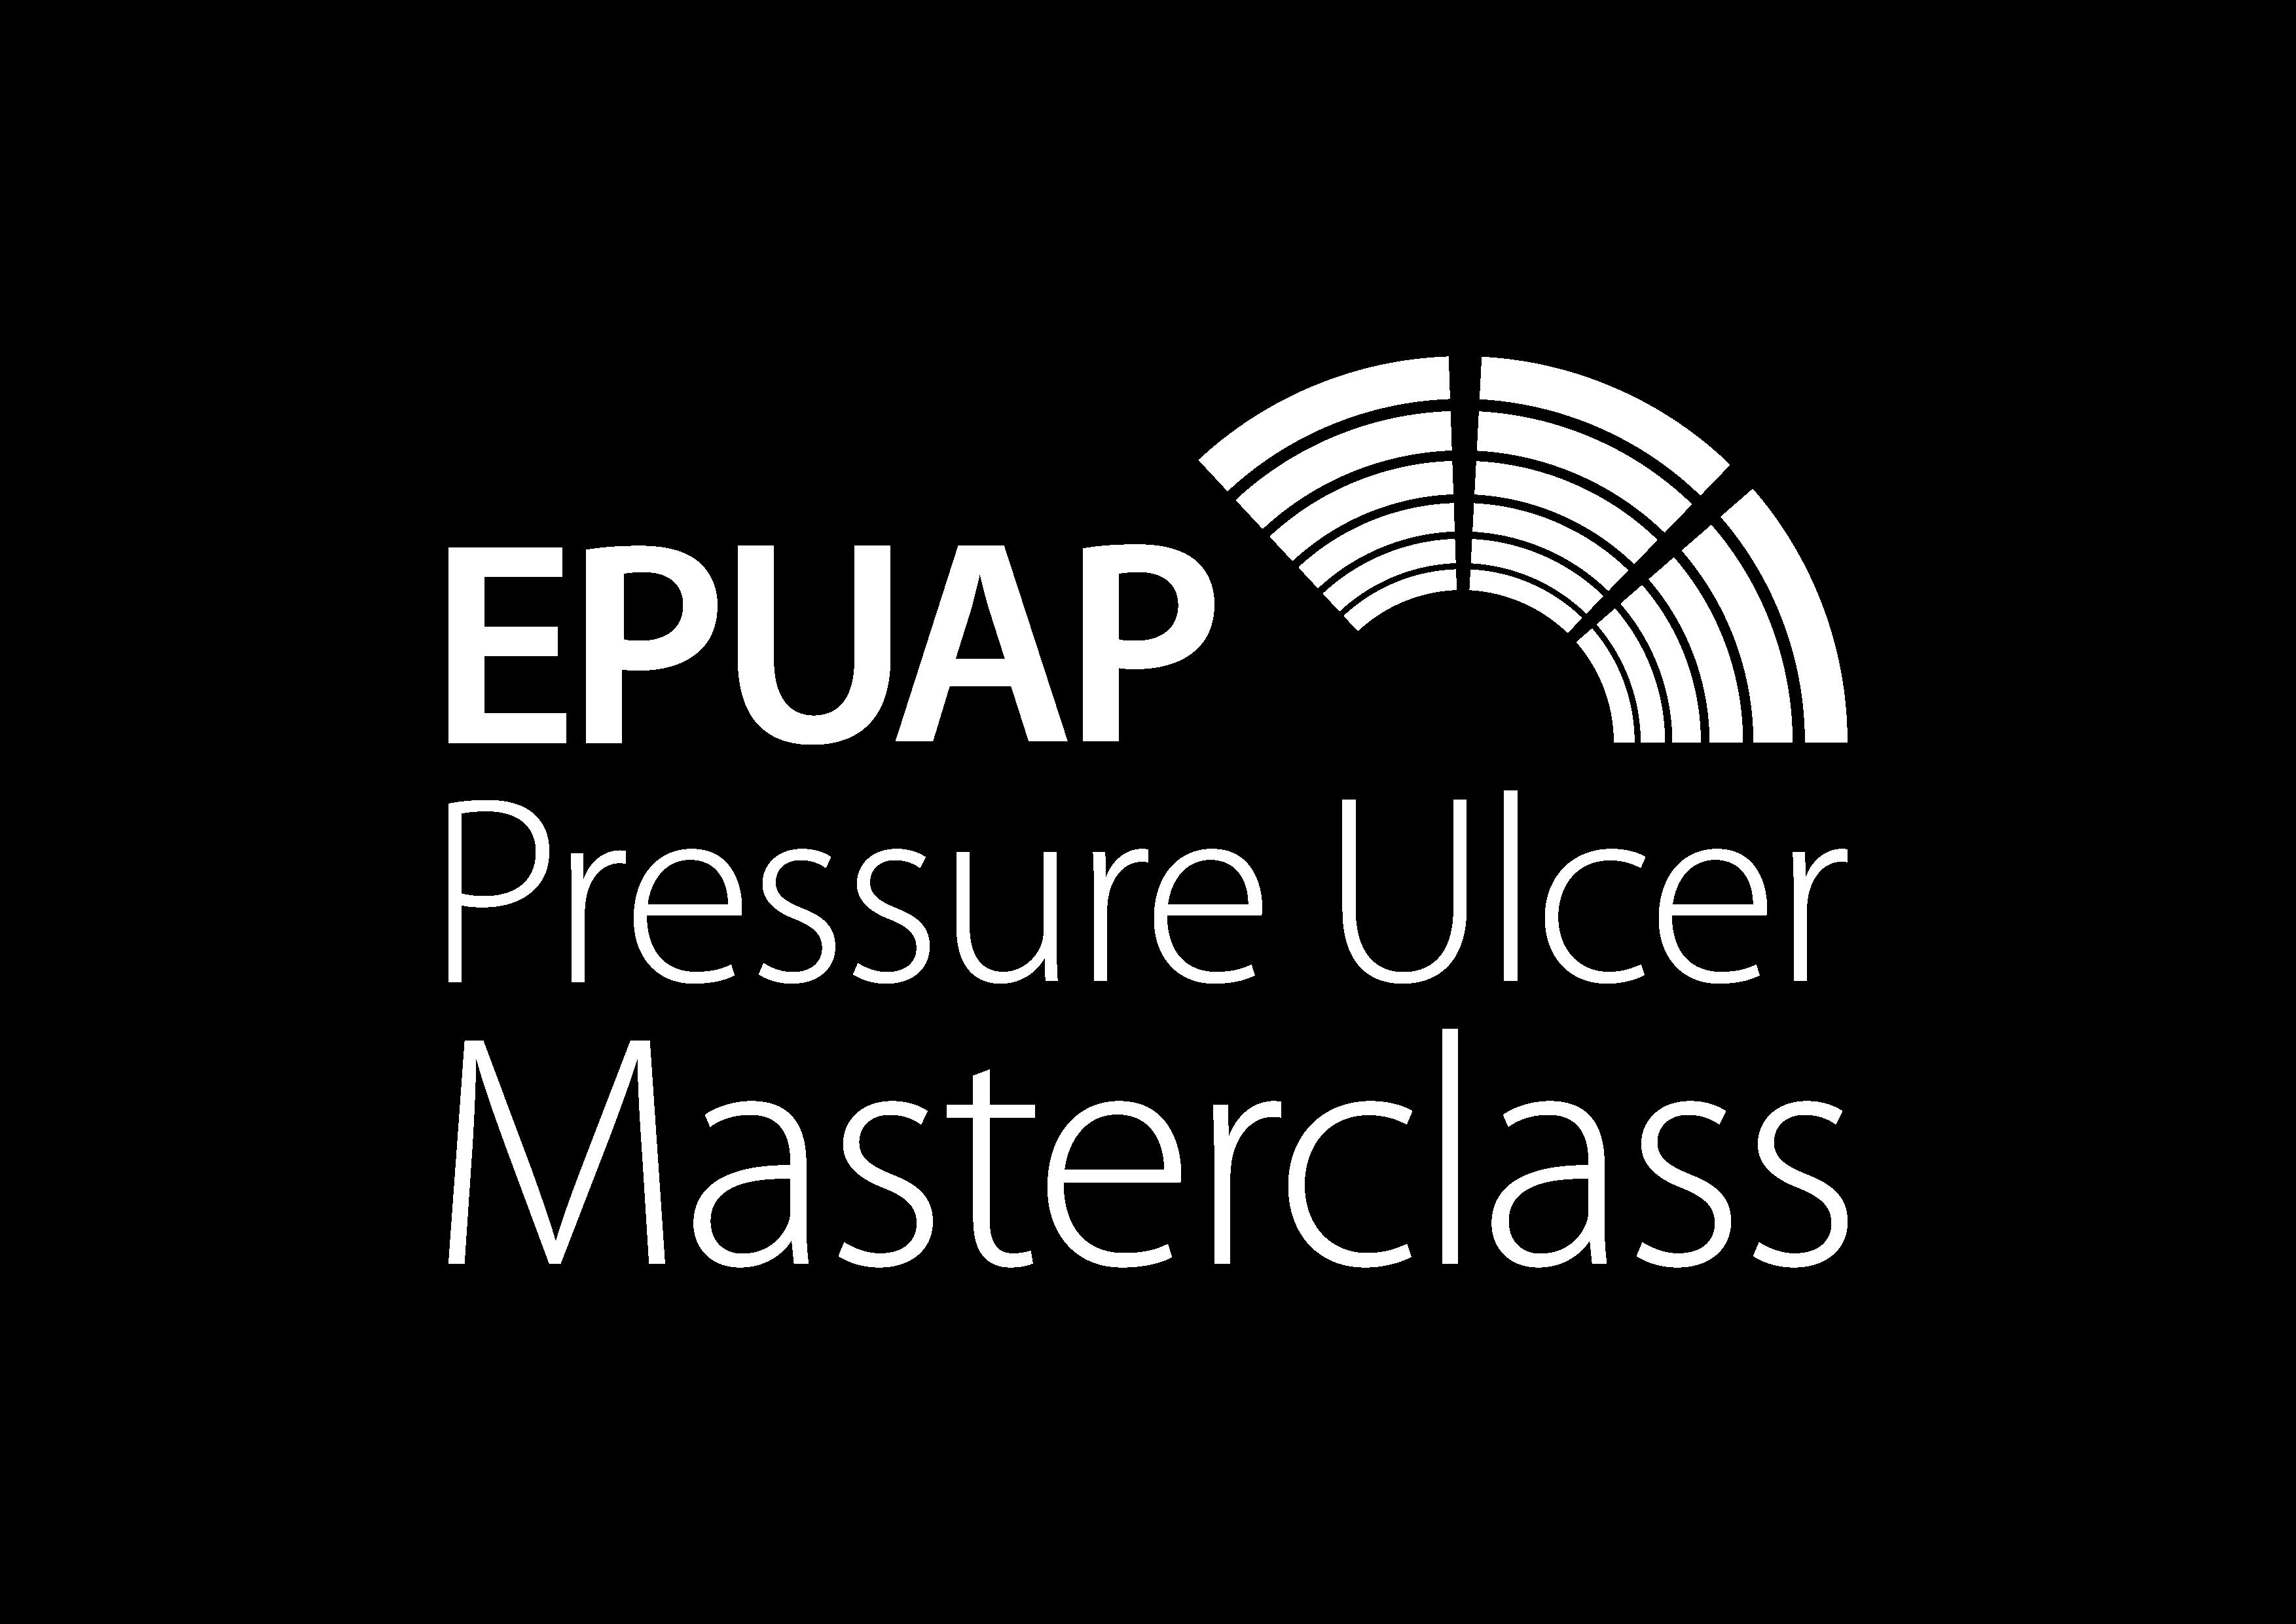 EPUAP Masterclass